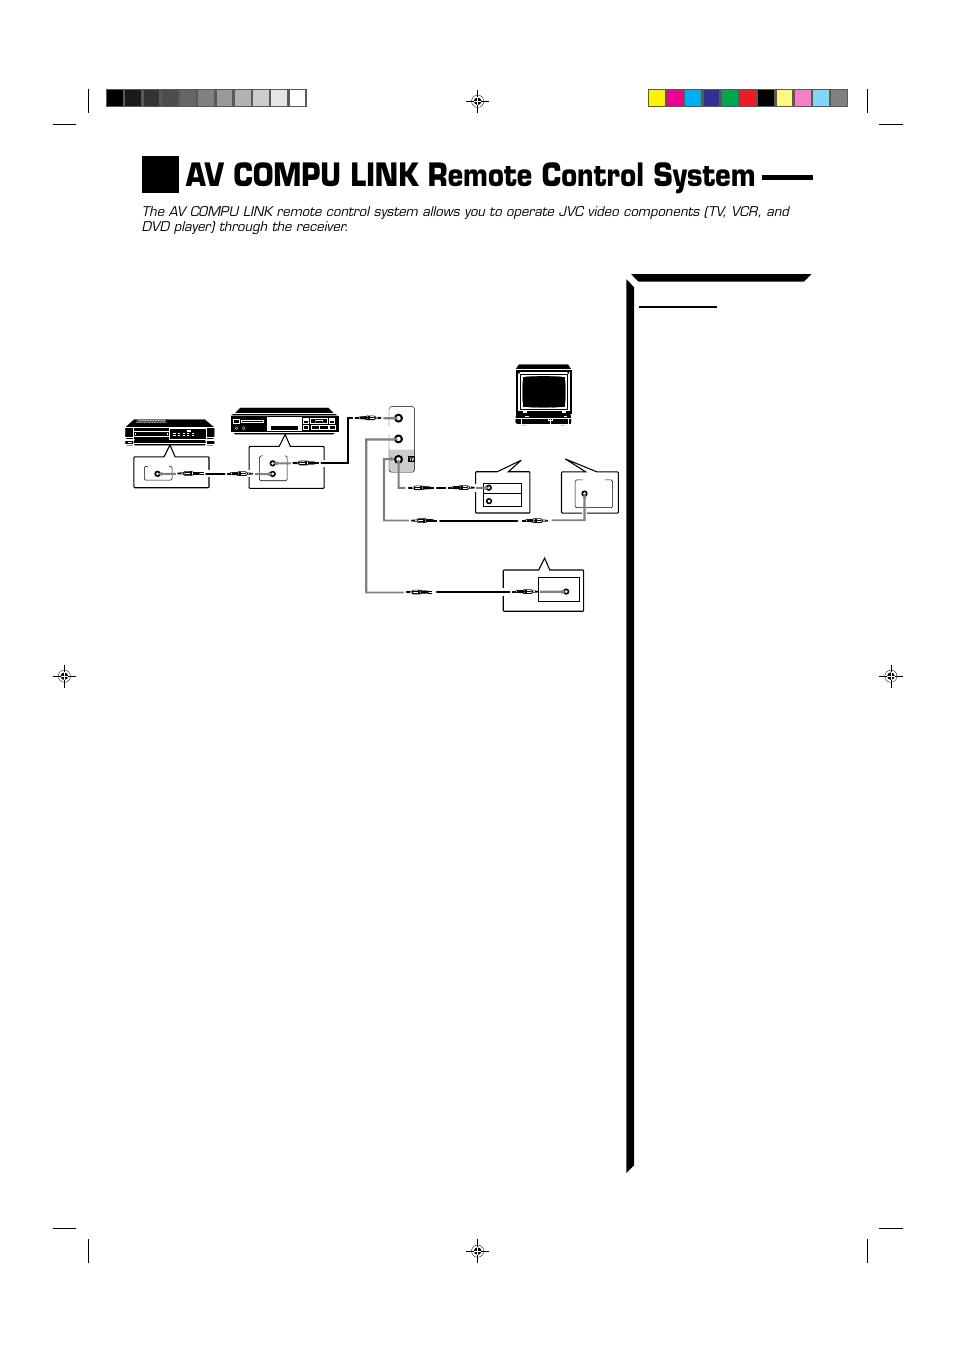 Av compu link remote control system | JVC RX-664VBK User Manual | Page 44